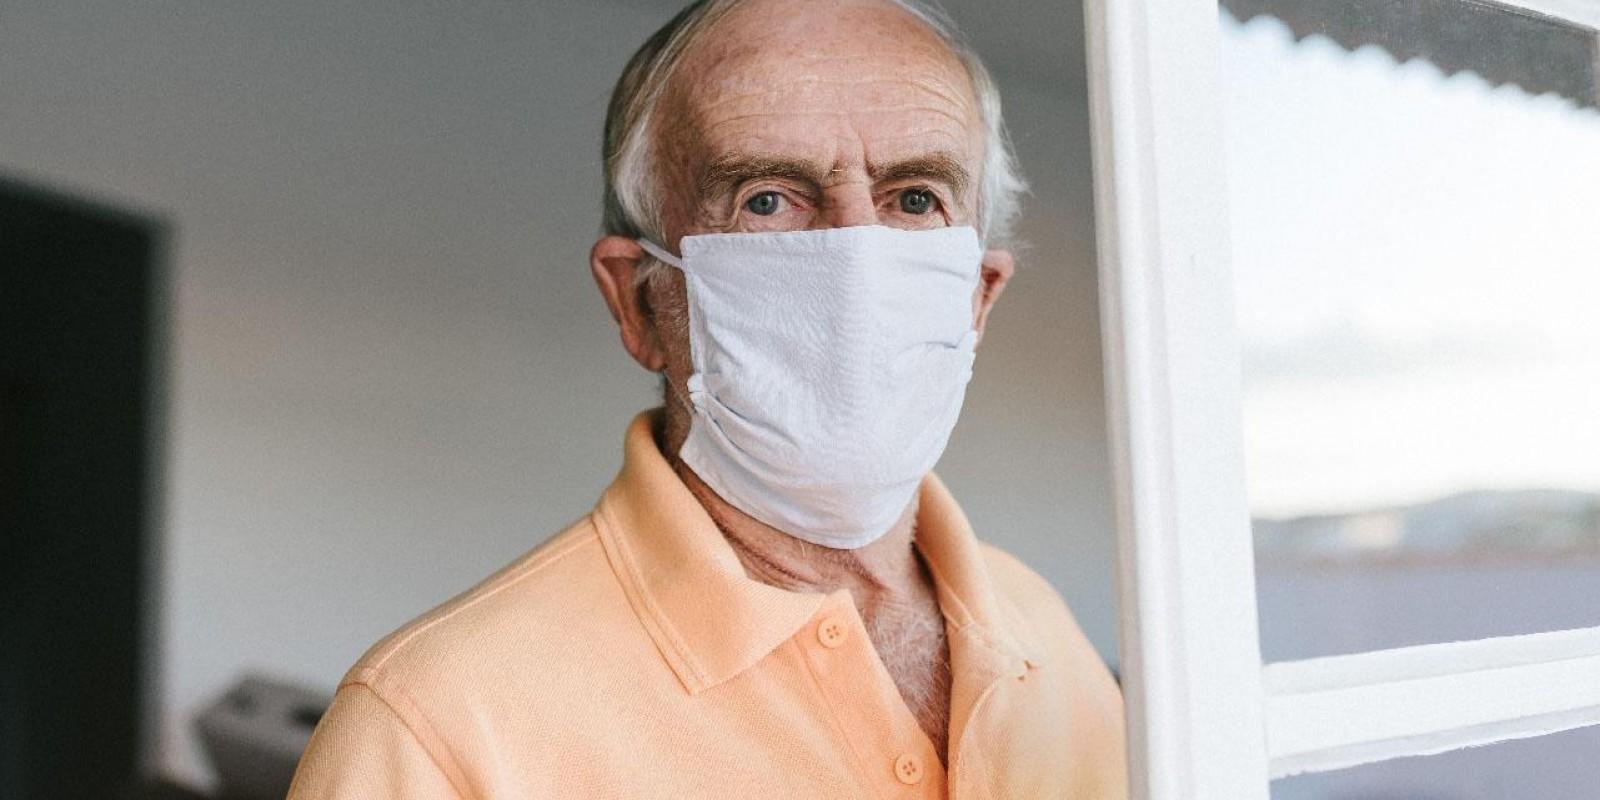 Coronavírus: Por Que Pandemia Está Acelerando Saída De Idosos Do Mercado De Trabalho